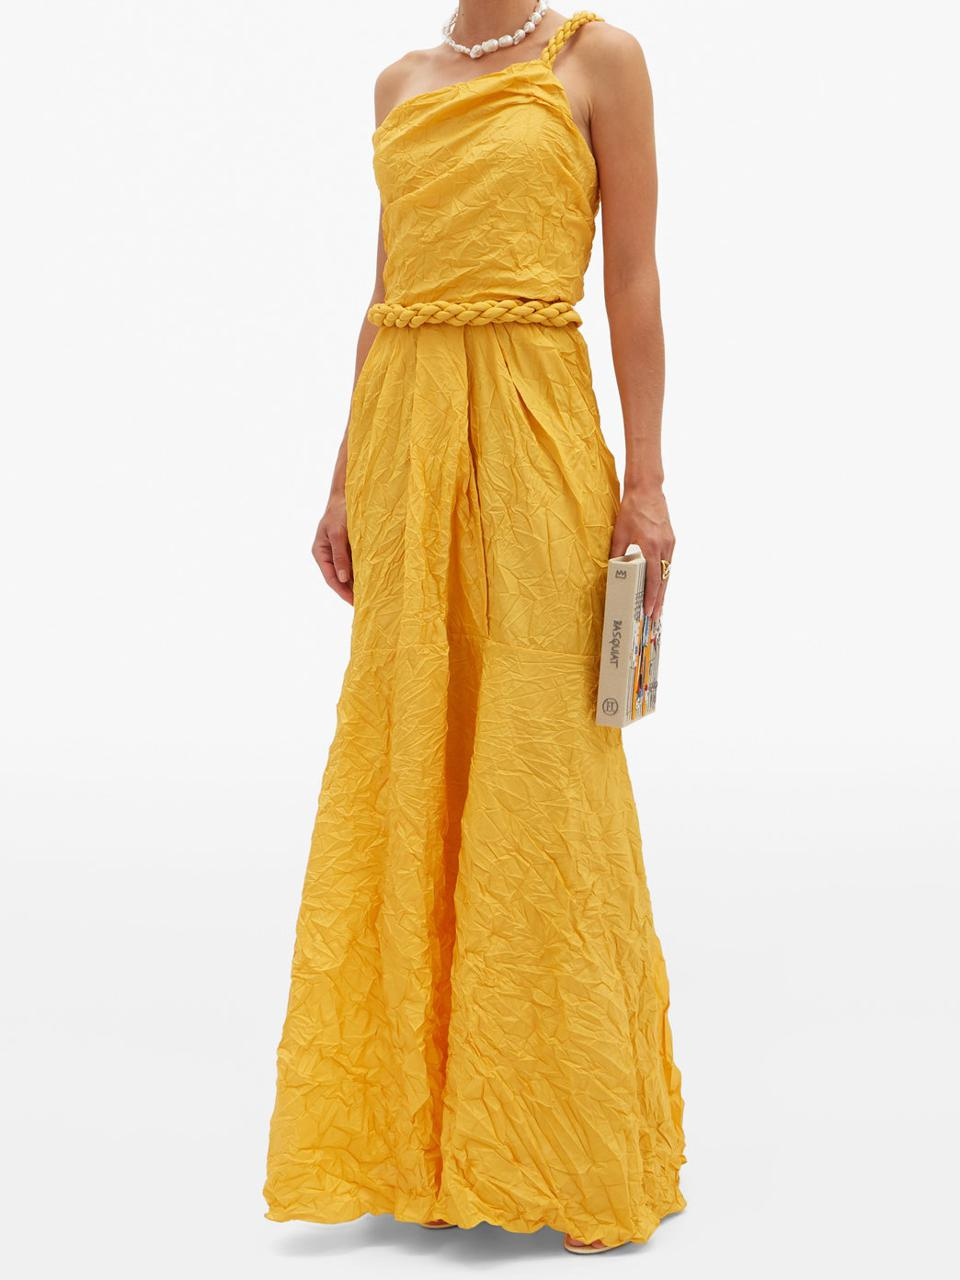 Le Carolina One-Shoulder Silk-Blend Taffeta Dress by Johanna Ortiz: